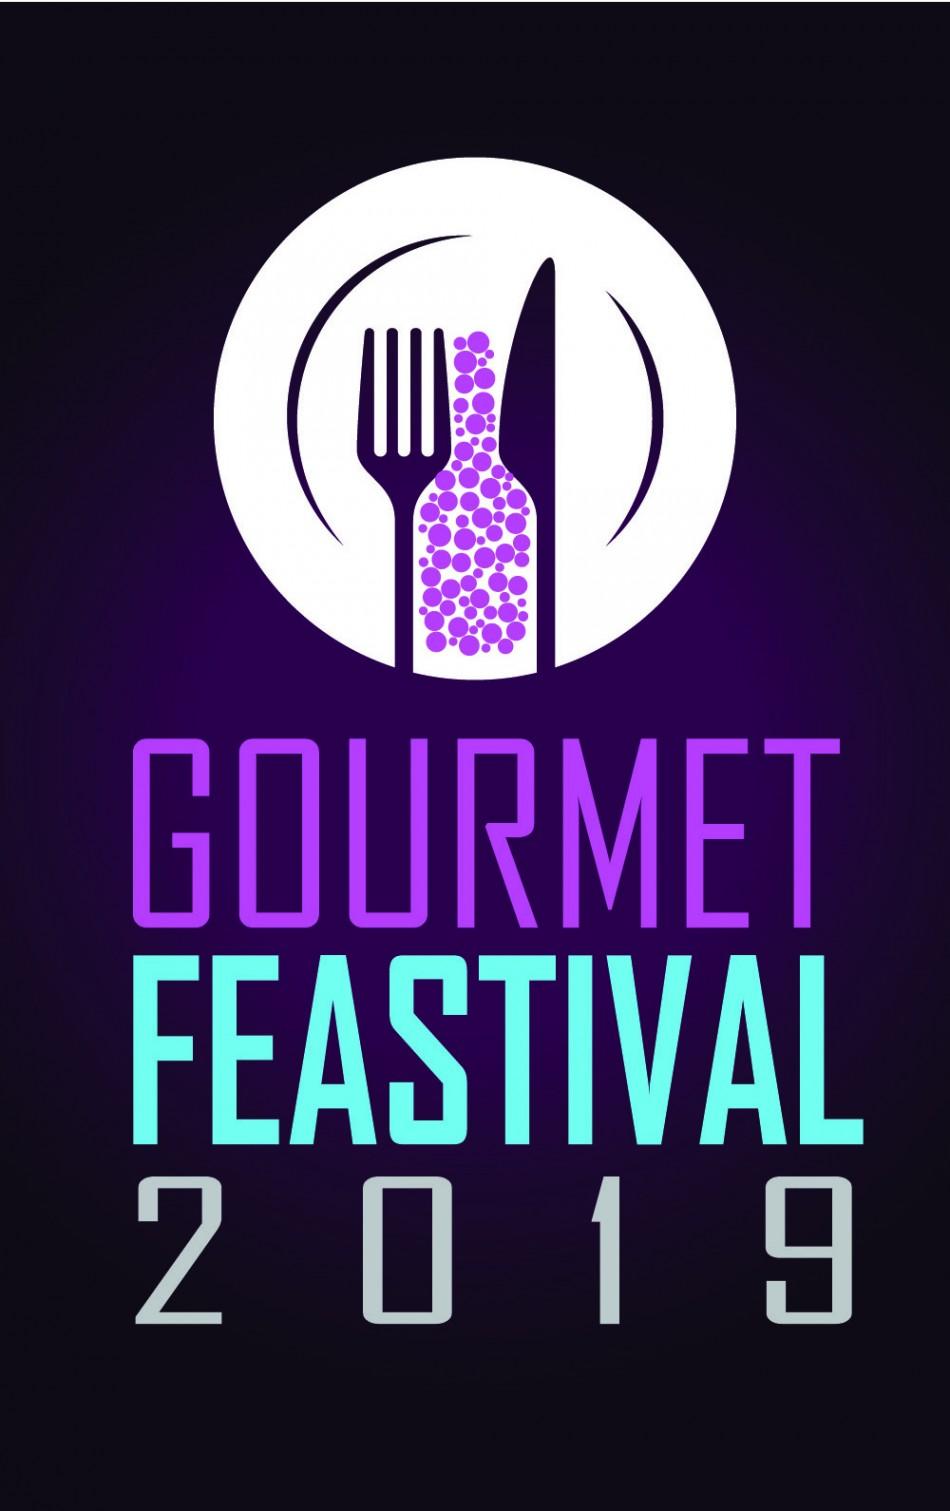 Gourmet Feastival